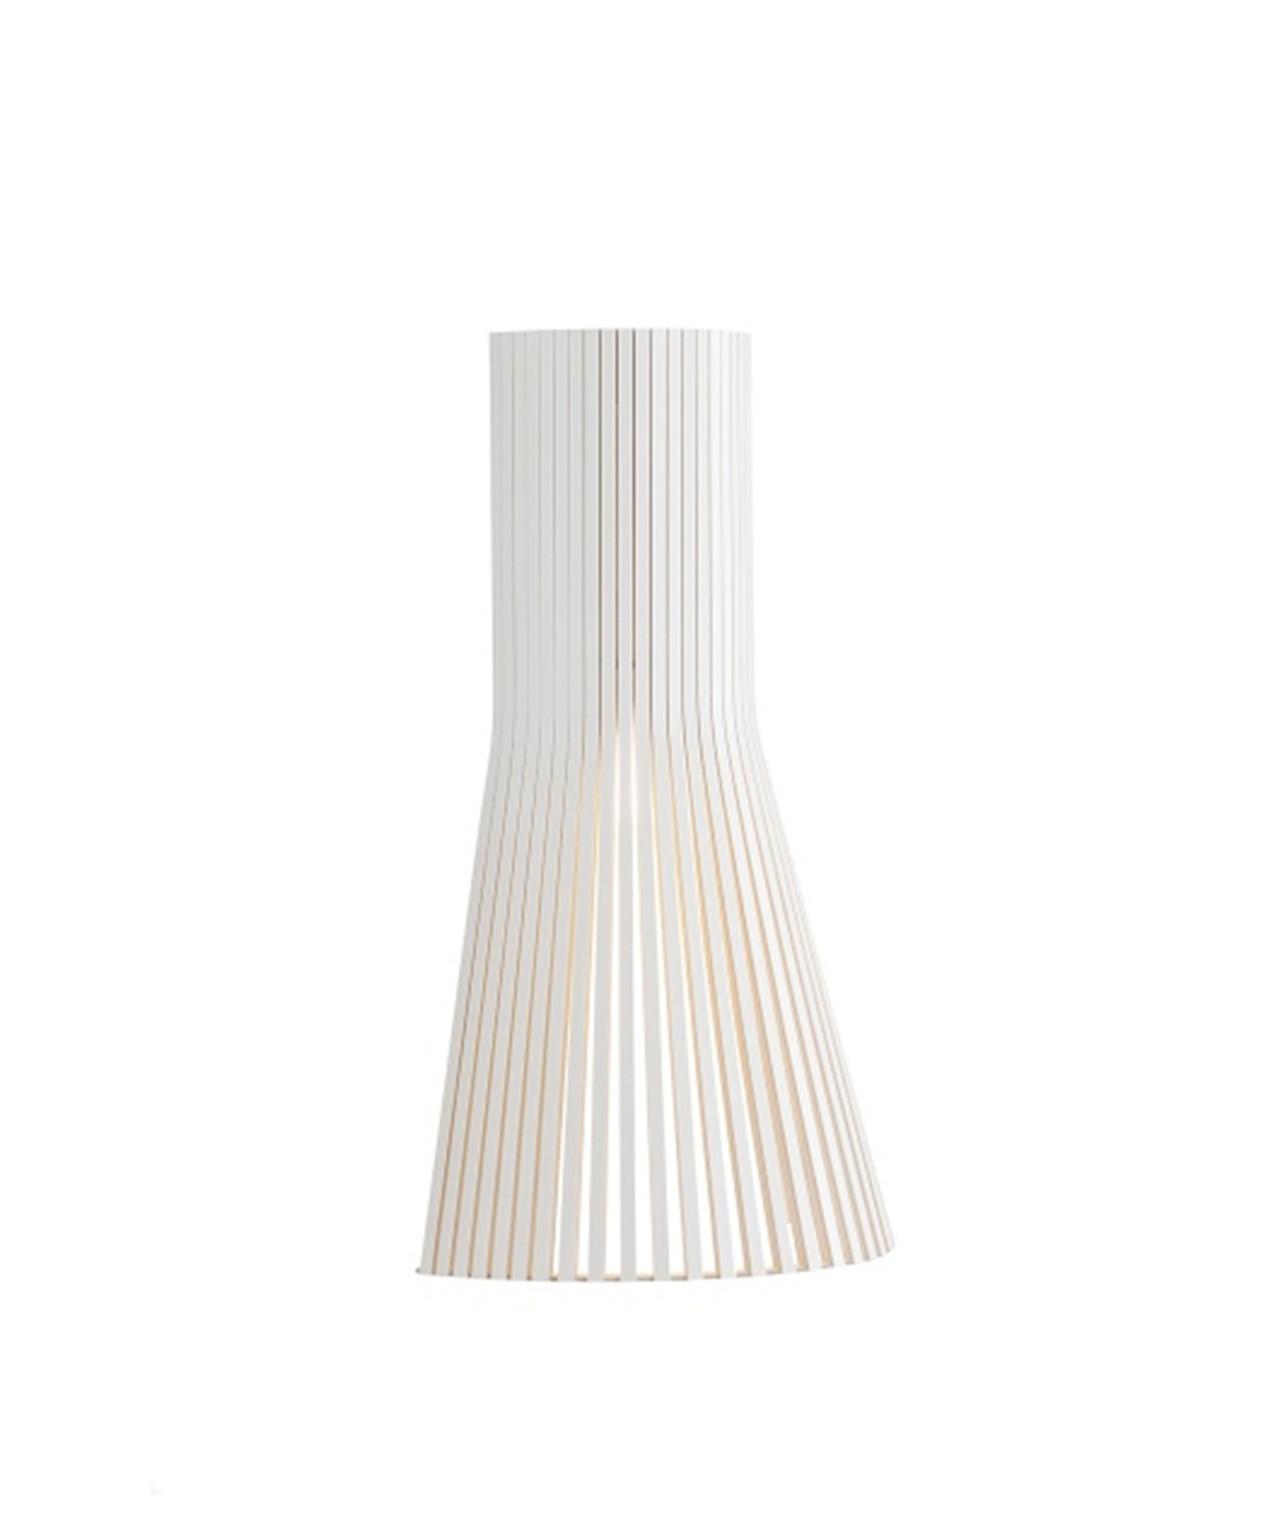 Secto 4231 Væglampe Hvid - Secto